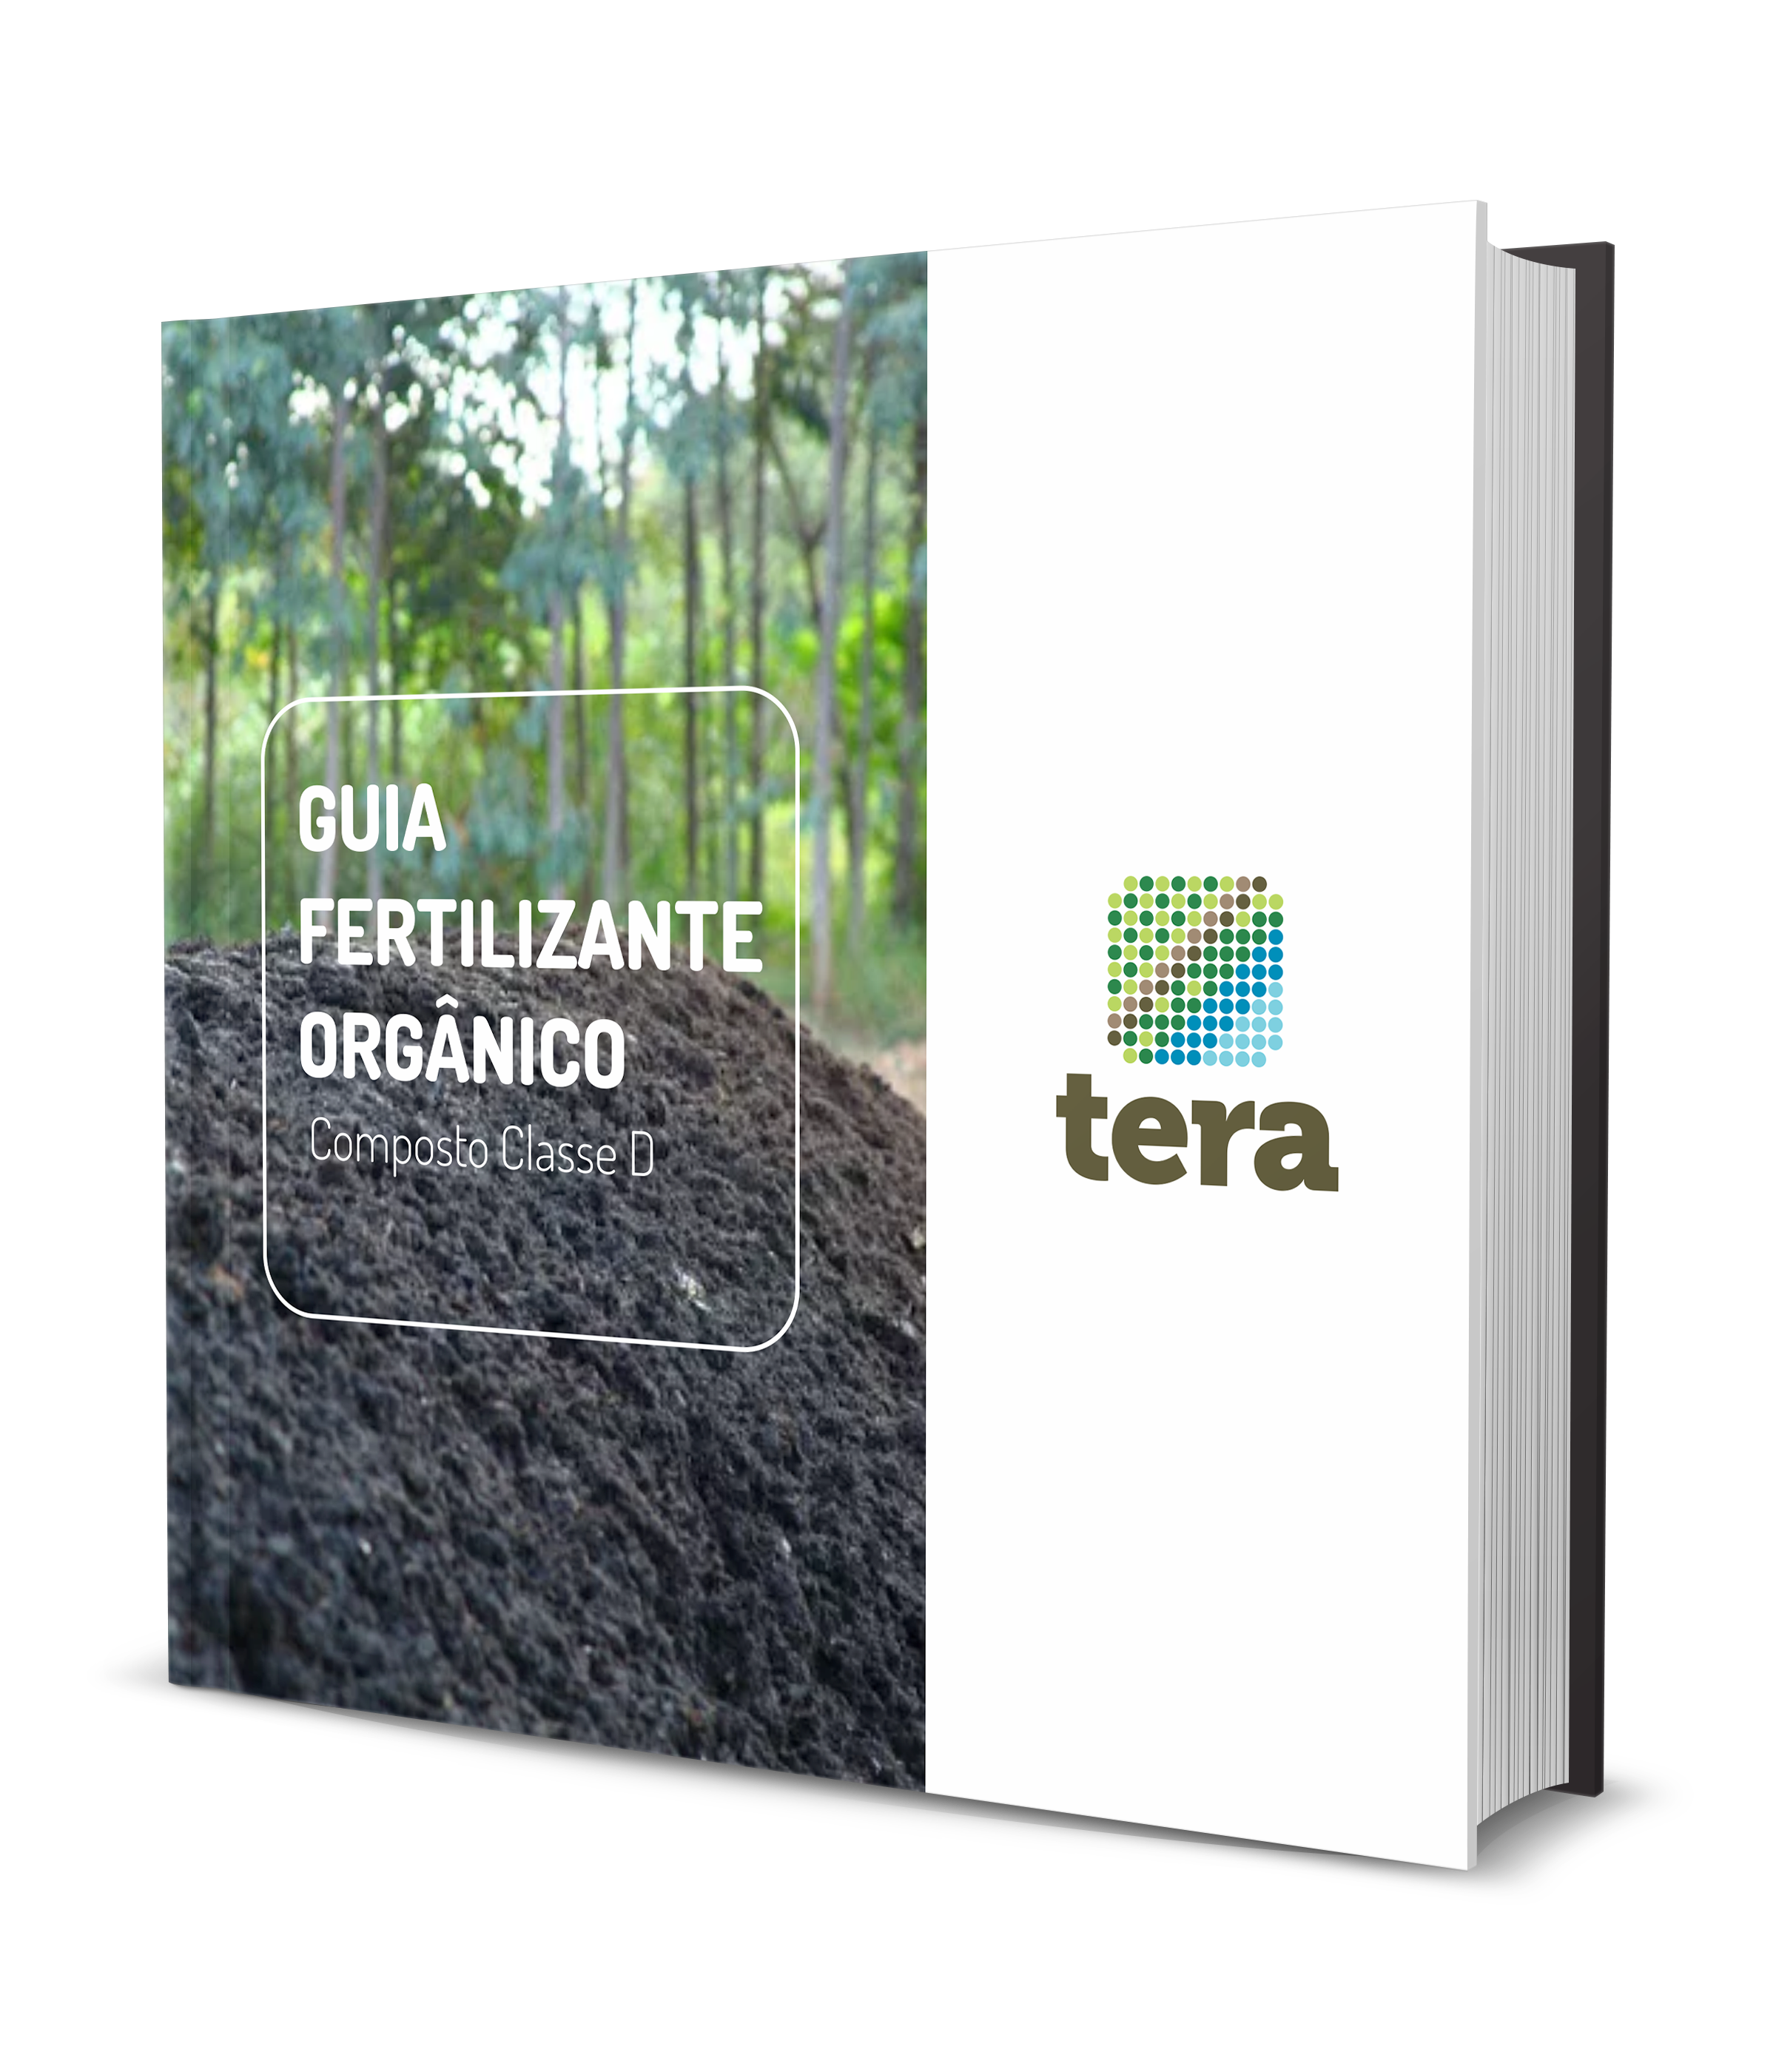 Guia Fertilizante Orgânico Composto Classe D